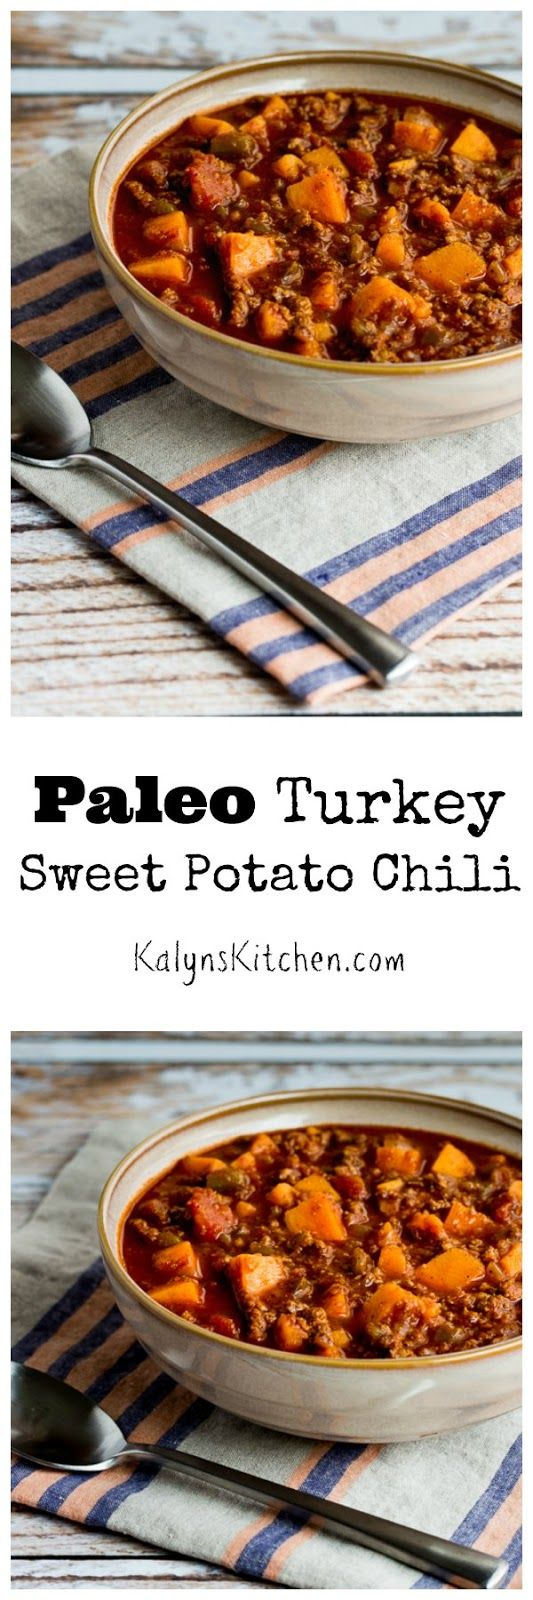 Paleo Turkey Sweet Potato Chili is also gluten-free and dairy-free. If you like savory sweet potato re